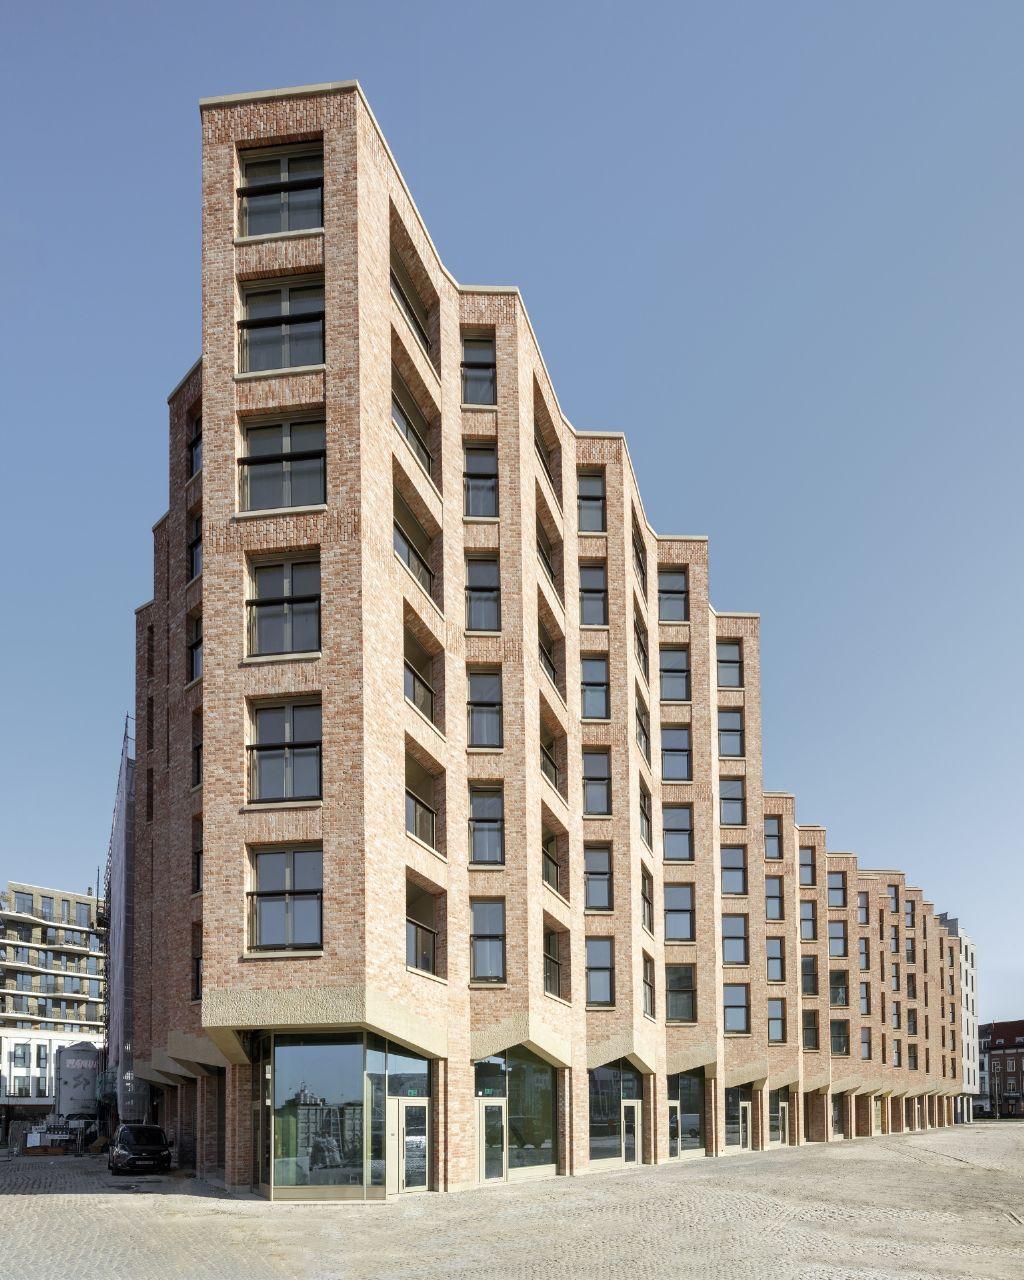 Havengebouw Cadix, Antwerpen: Sergison Bates architects i.s.m. eld